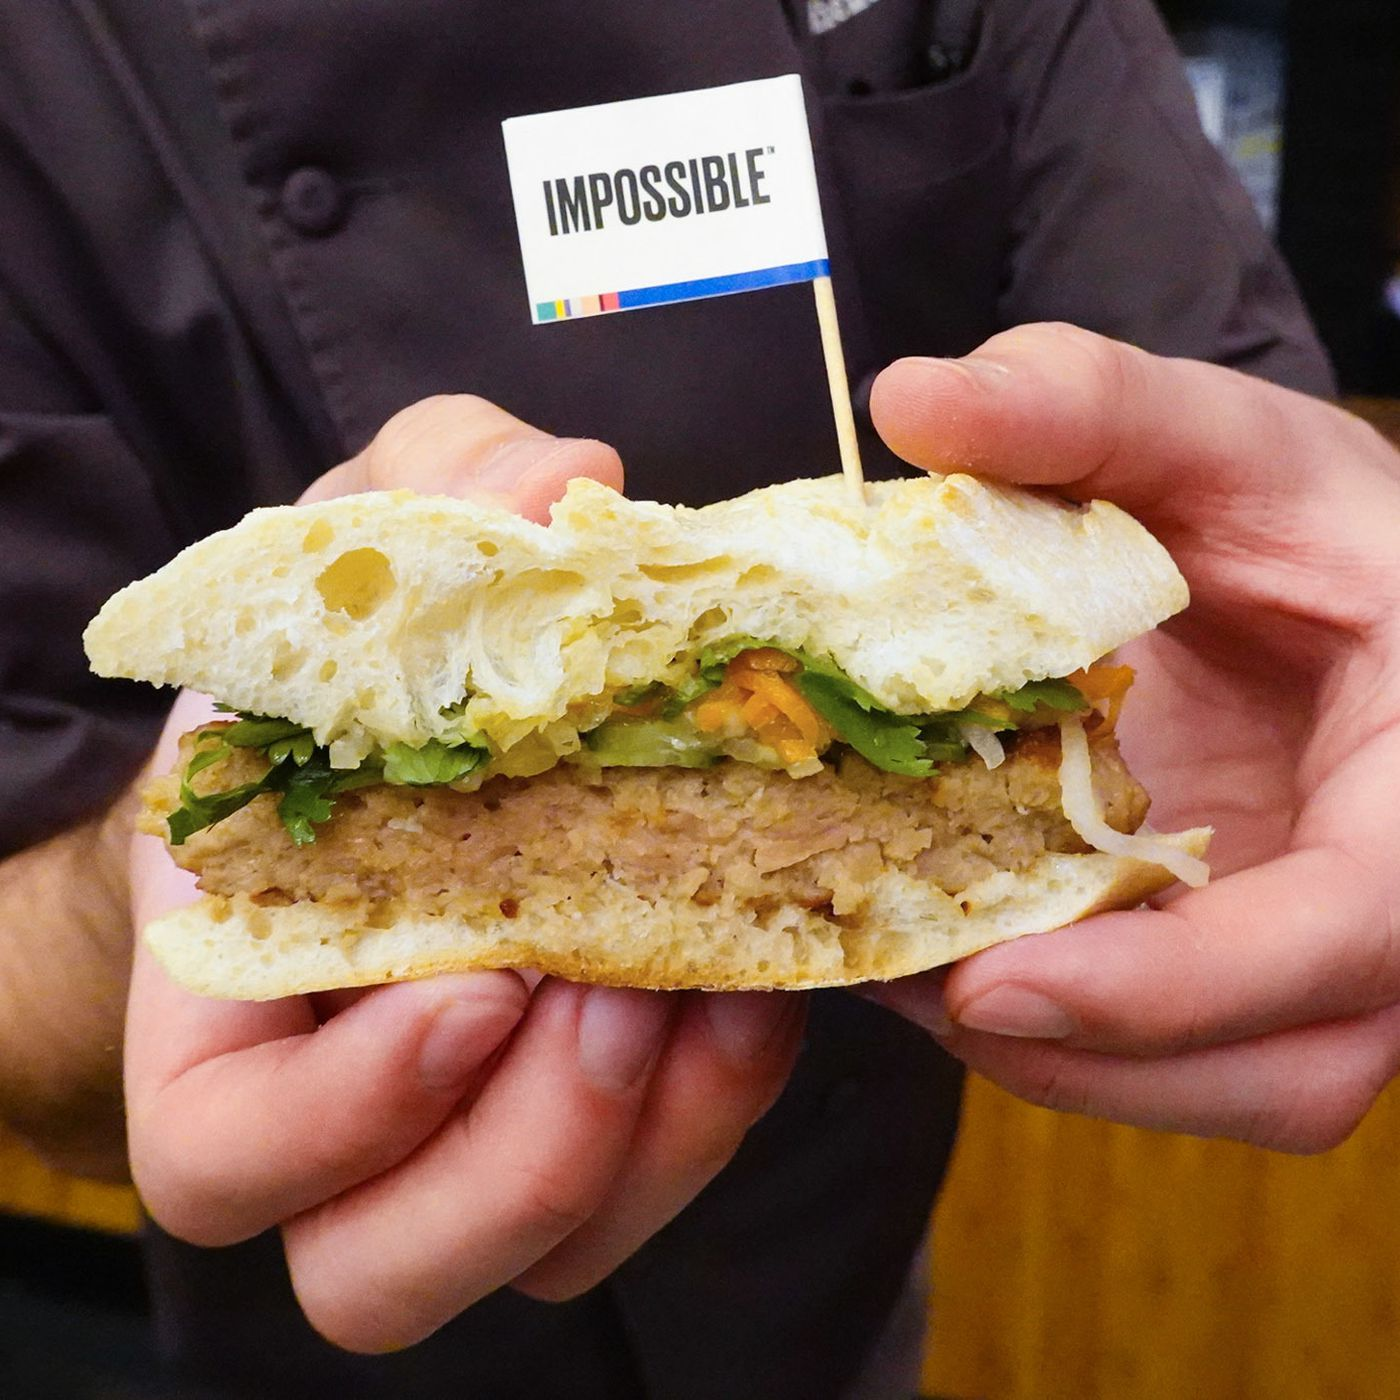 Impossible Pork E Impossible Sausage